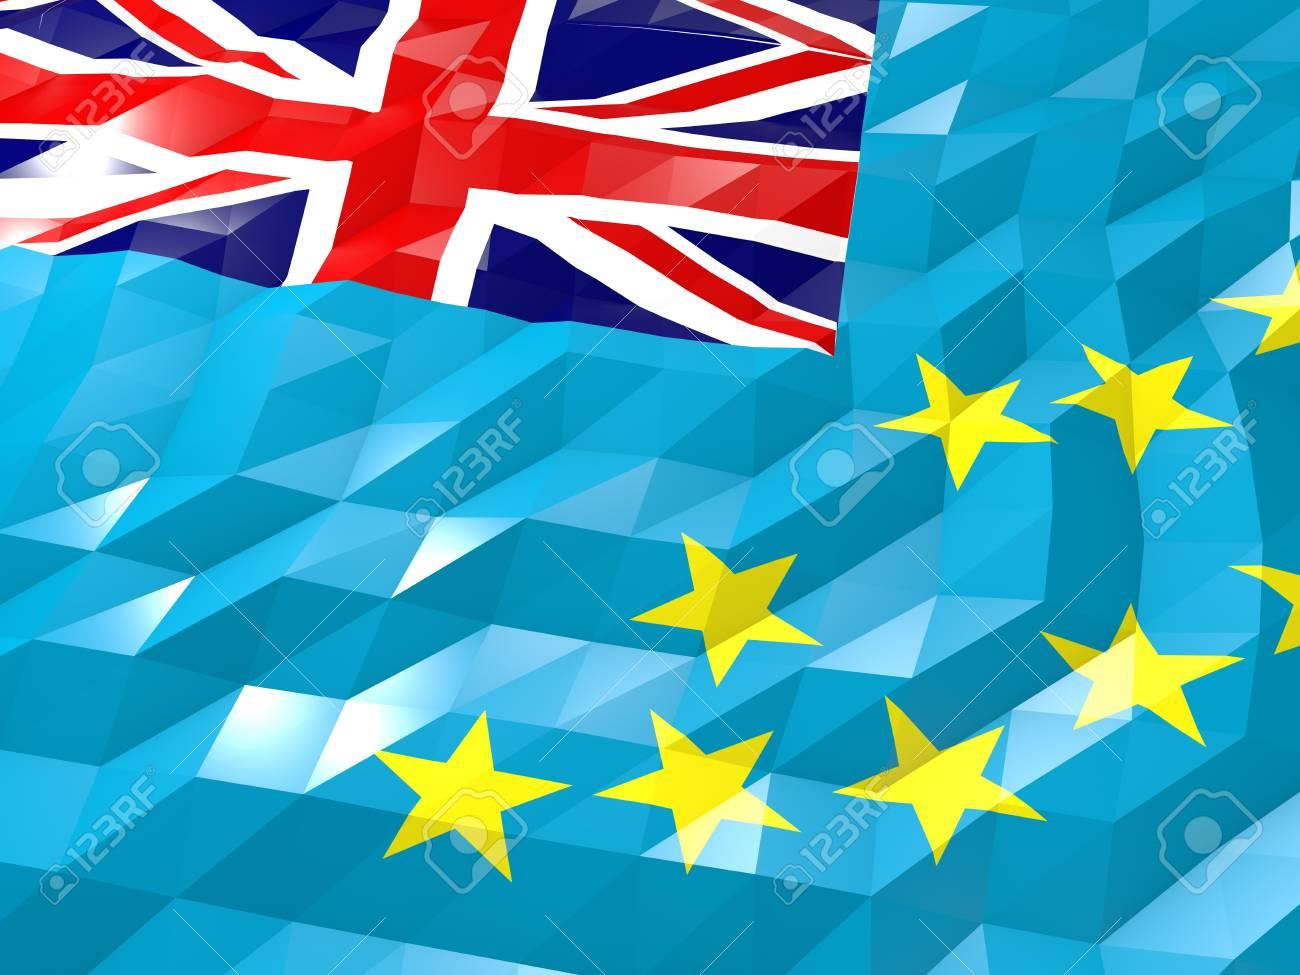 Flag Of Tuvalu 3D Wallpaper Illustration National Symbol Low 1300x975